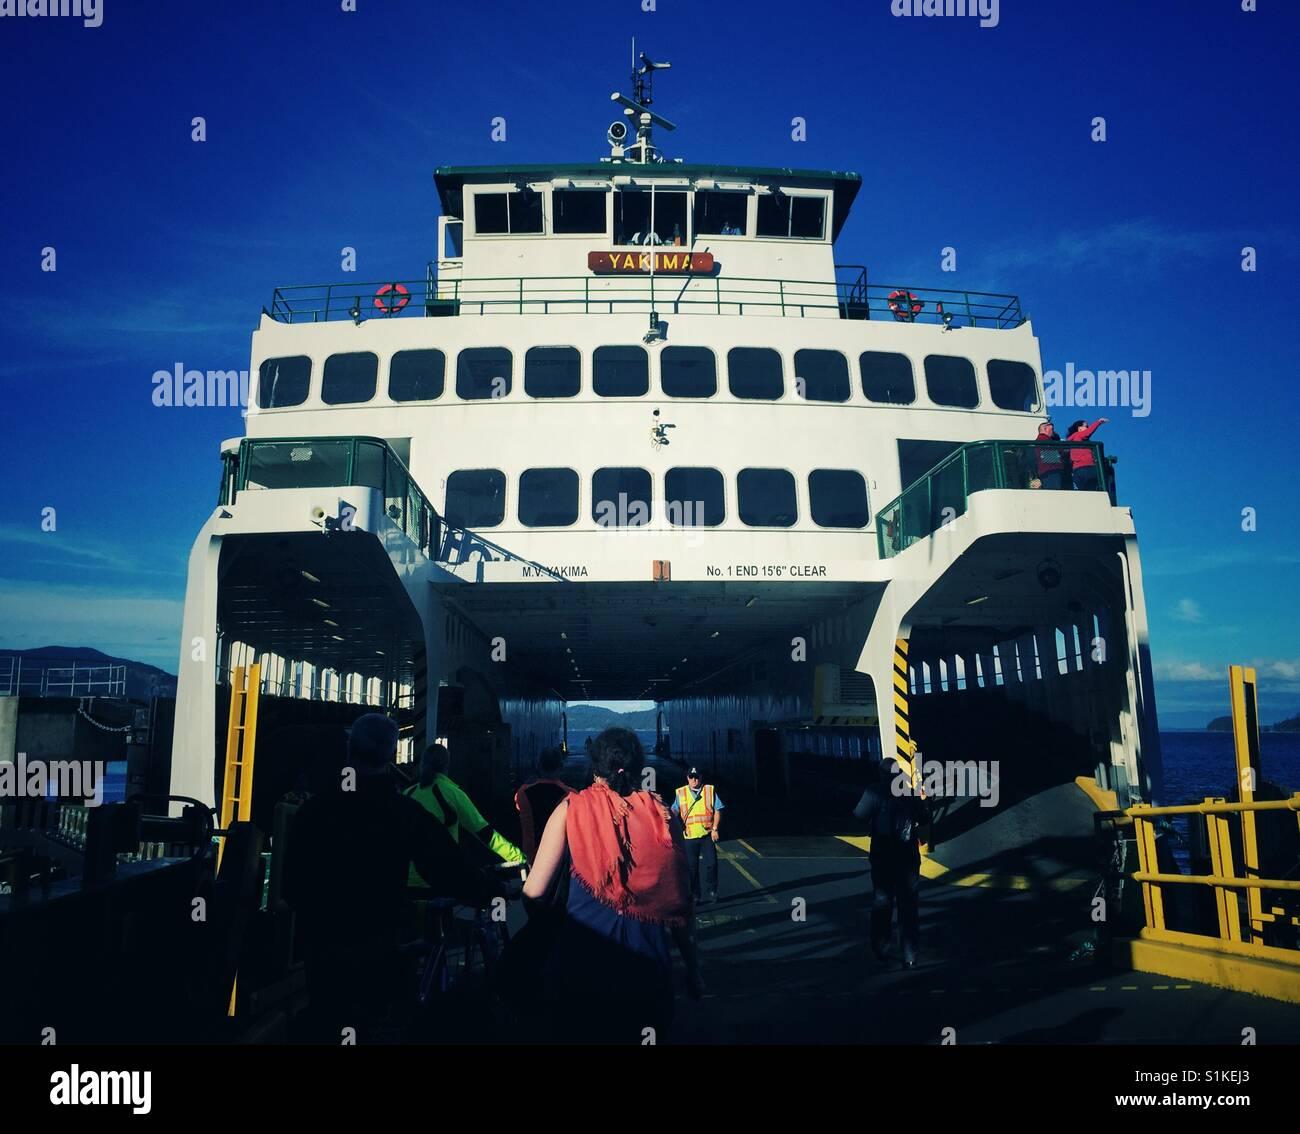 People walking on the Washington state ferry  on Lopez island - Stock Image